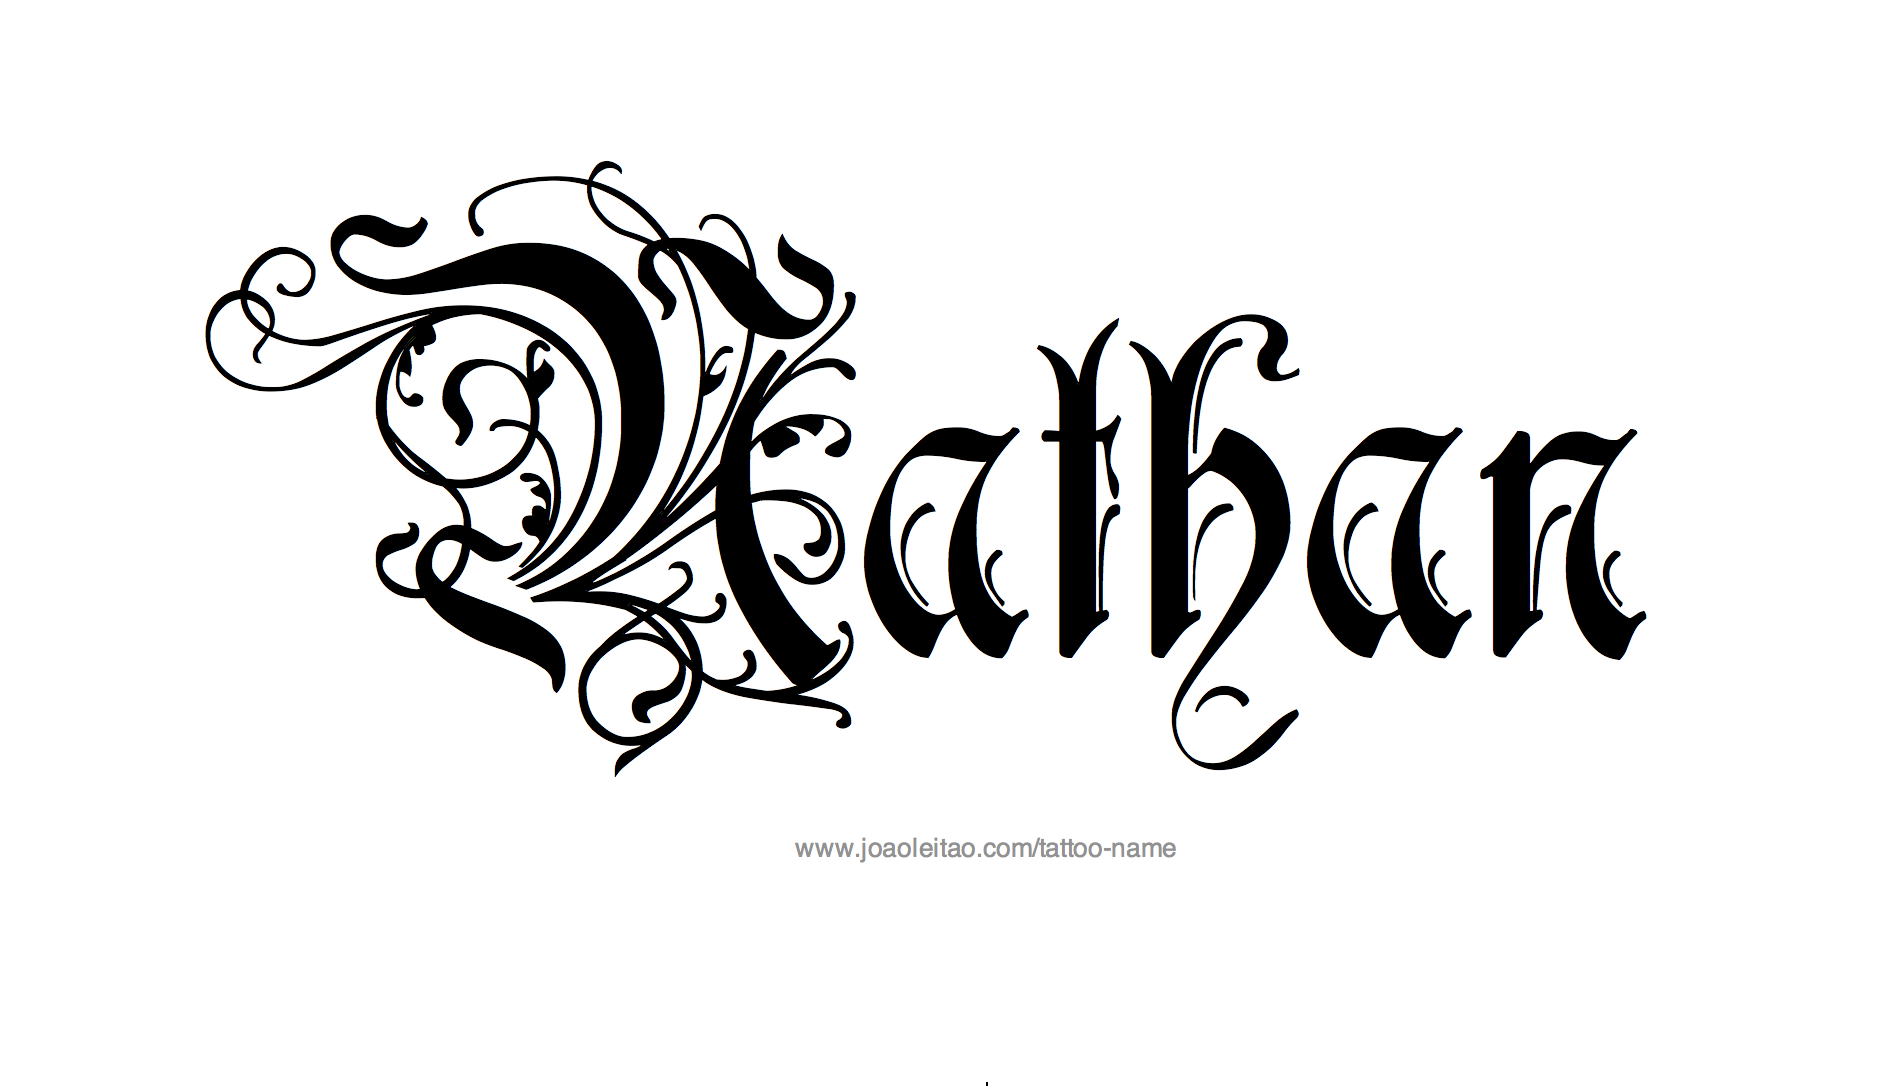 nathan name tattoo designs. Black Bedroom Furniture Sets. Home Design Ideas